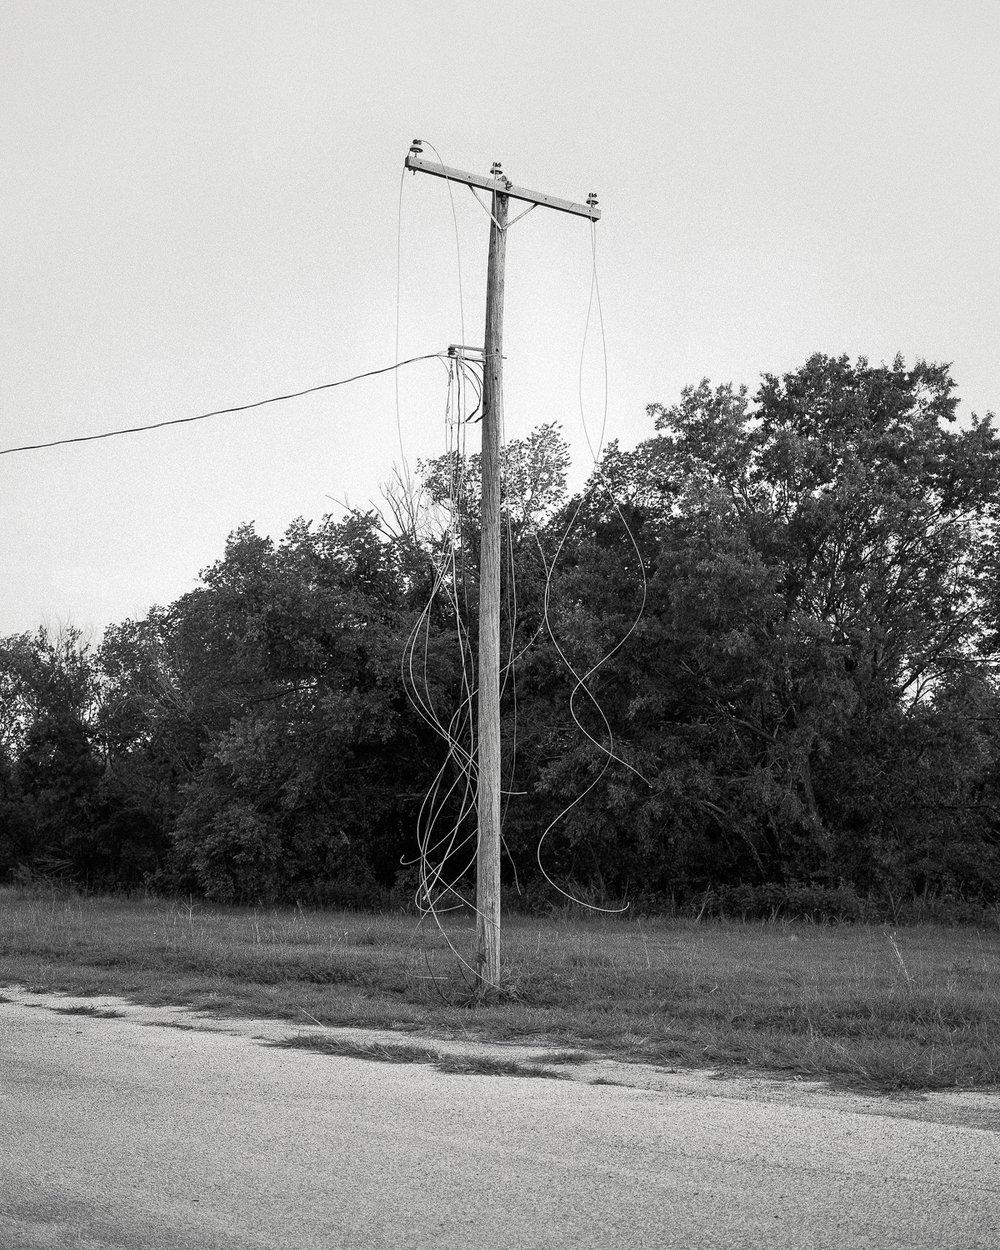 texas-2400-3.jpg